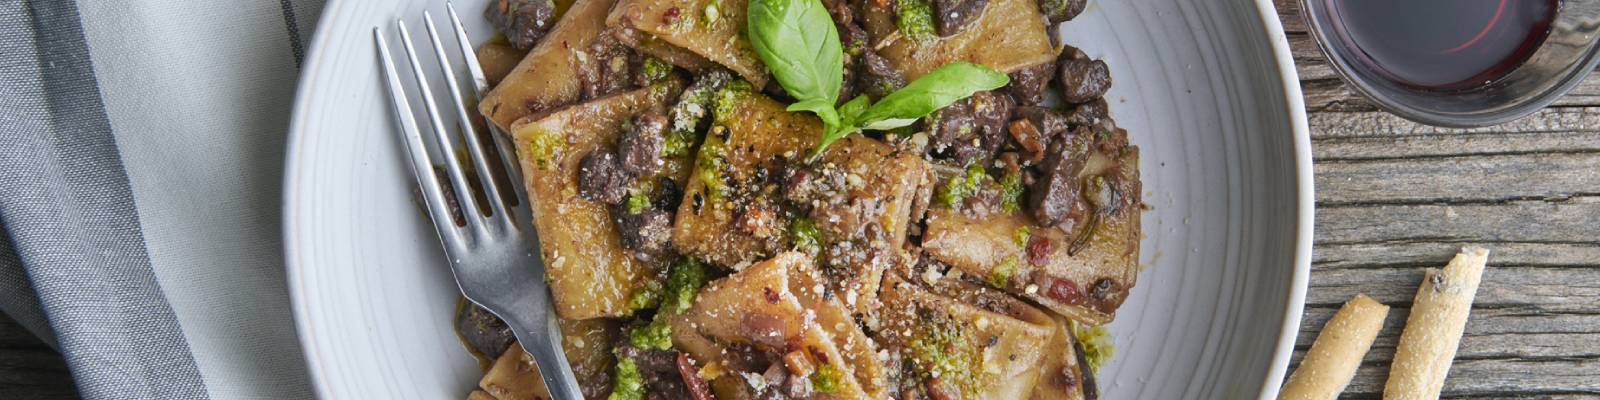 Pasta Garofalo - Schiaffoni with Fennel Seed Infused Meat and Mixed Mushroom Ragu